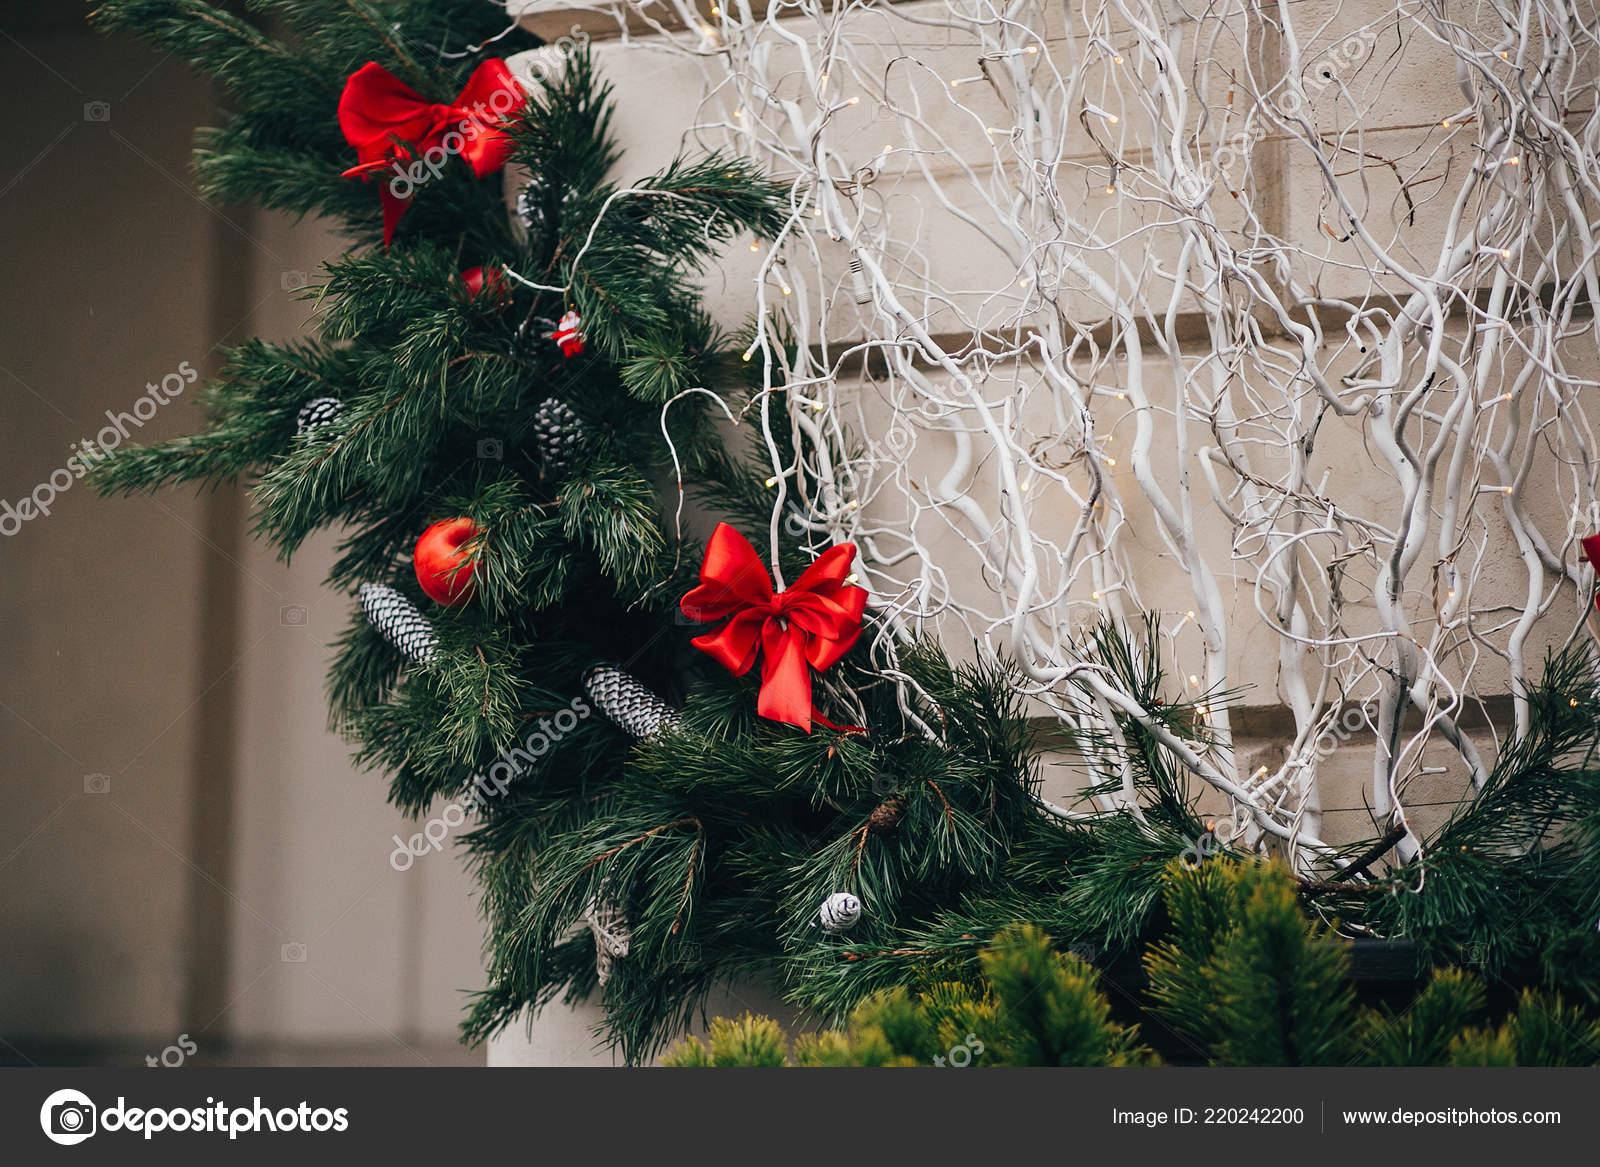 Stylish Christmas Wreath Red Bows Ornaments Pine Cones Stars White Stock Photo C Sonyachny 220242200